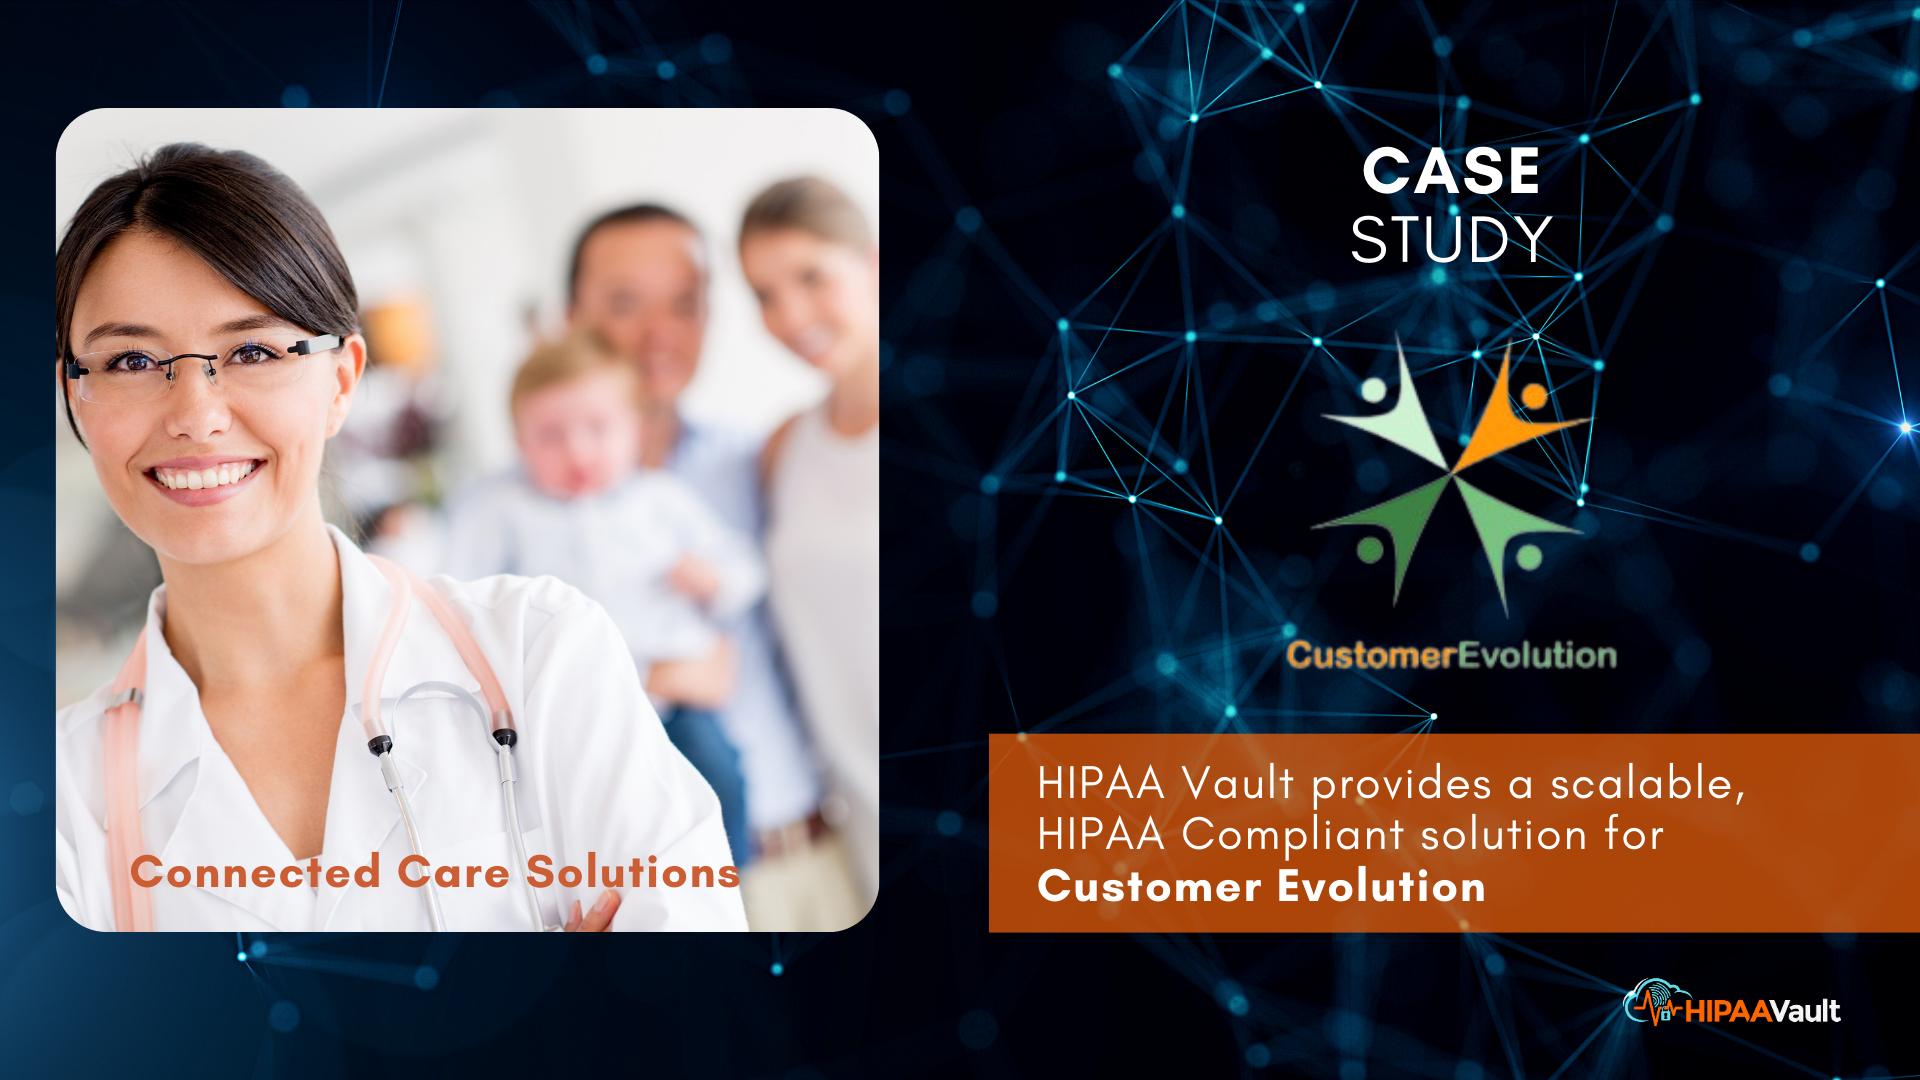 Customer Evolution – HIPAA Vault Case Study